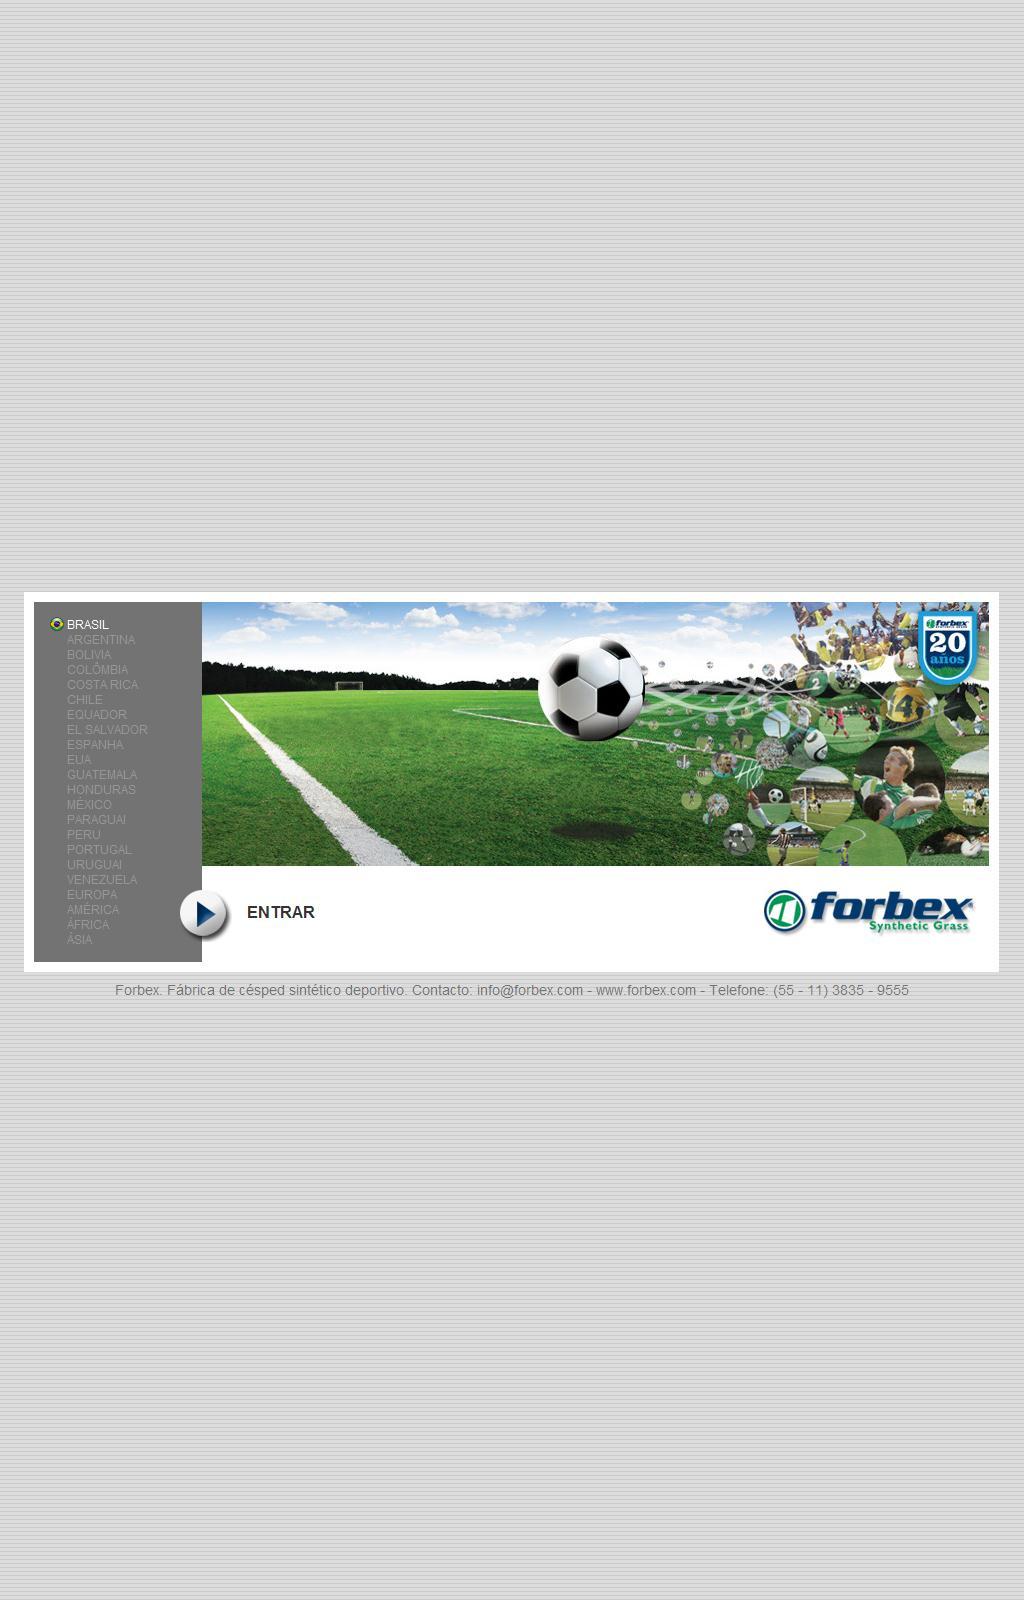 Grama Sintetica Forbex - Grama Artificial - Grama Futebol